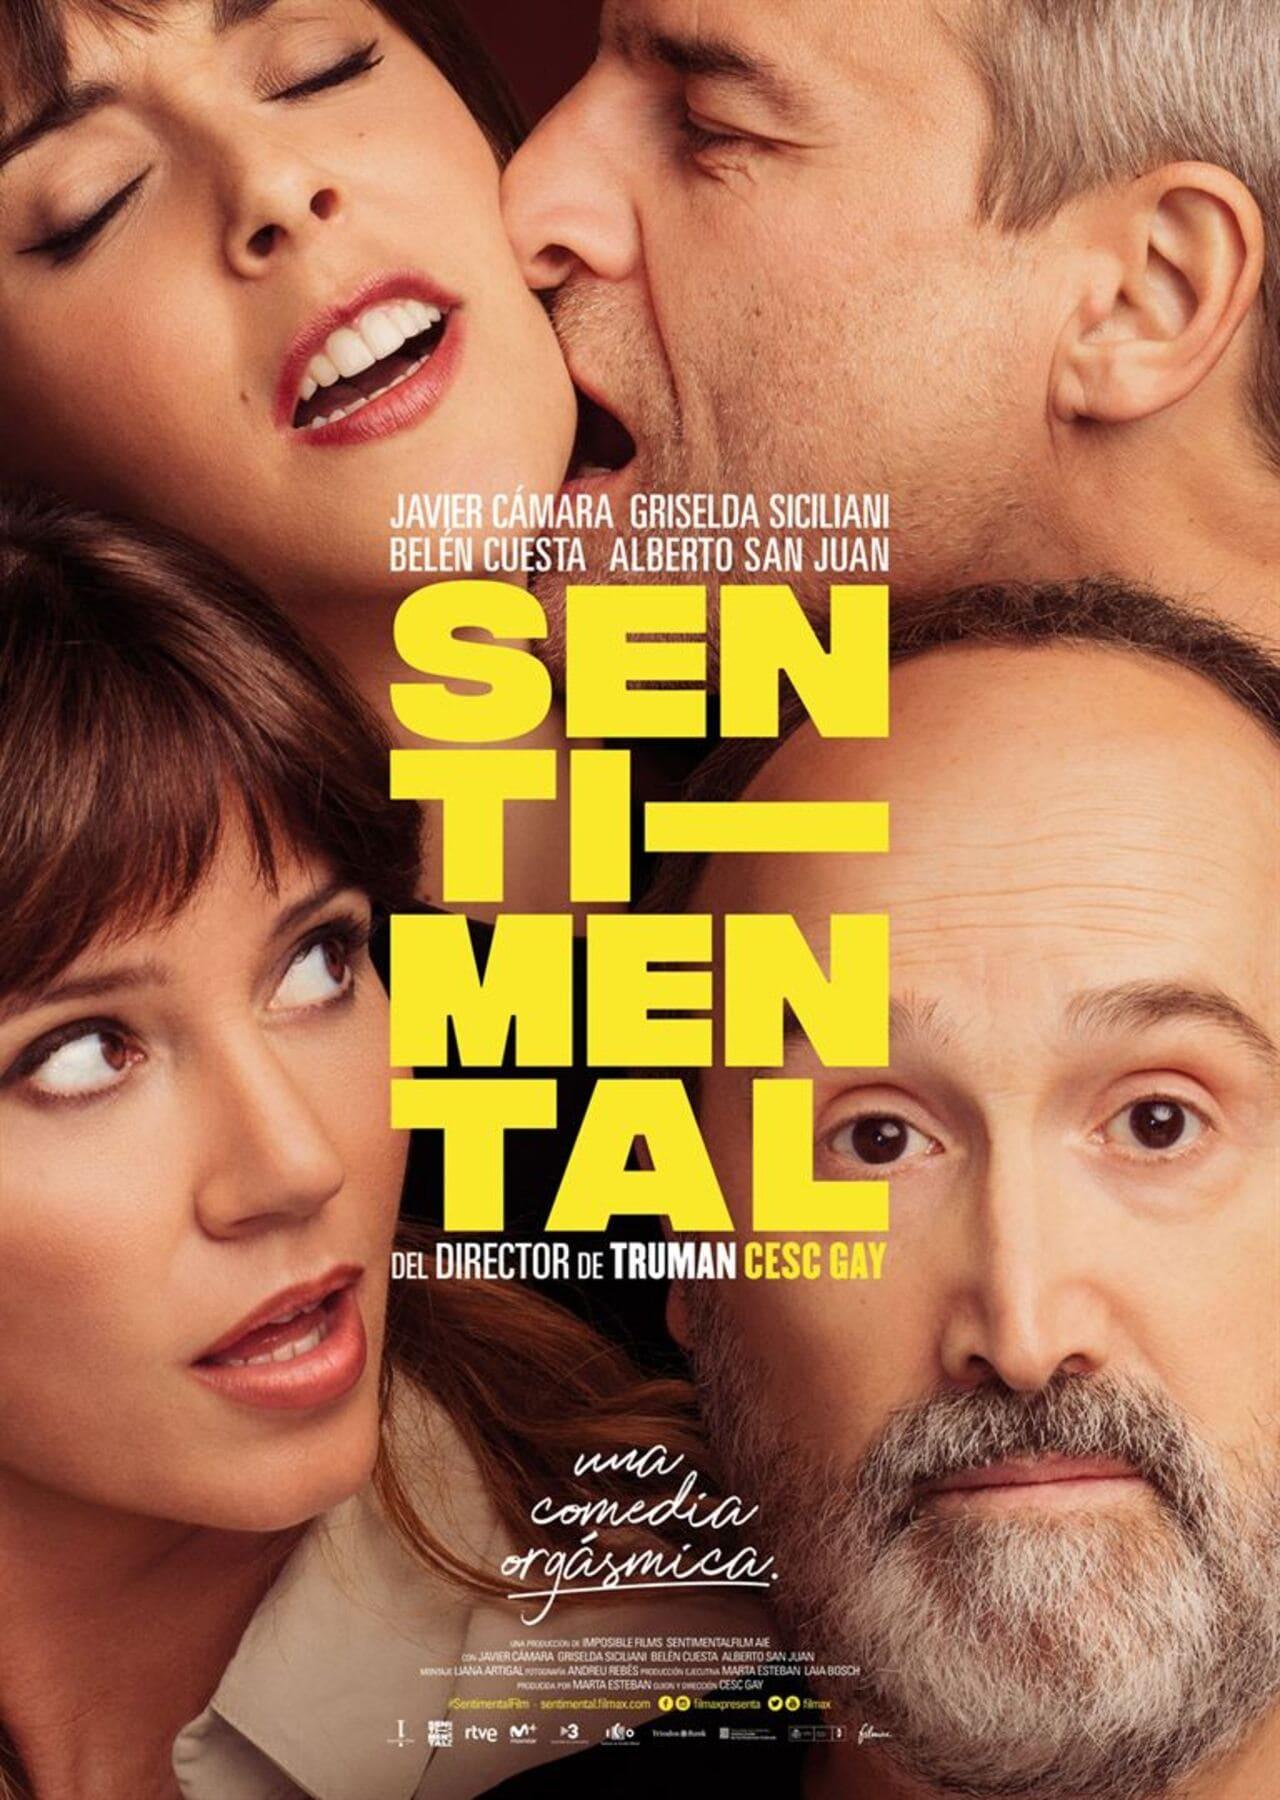 Cartel de la película Sentimental